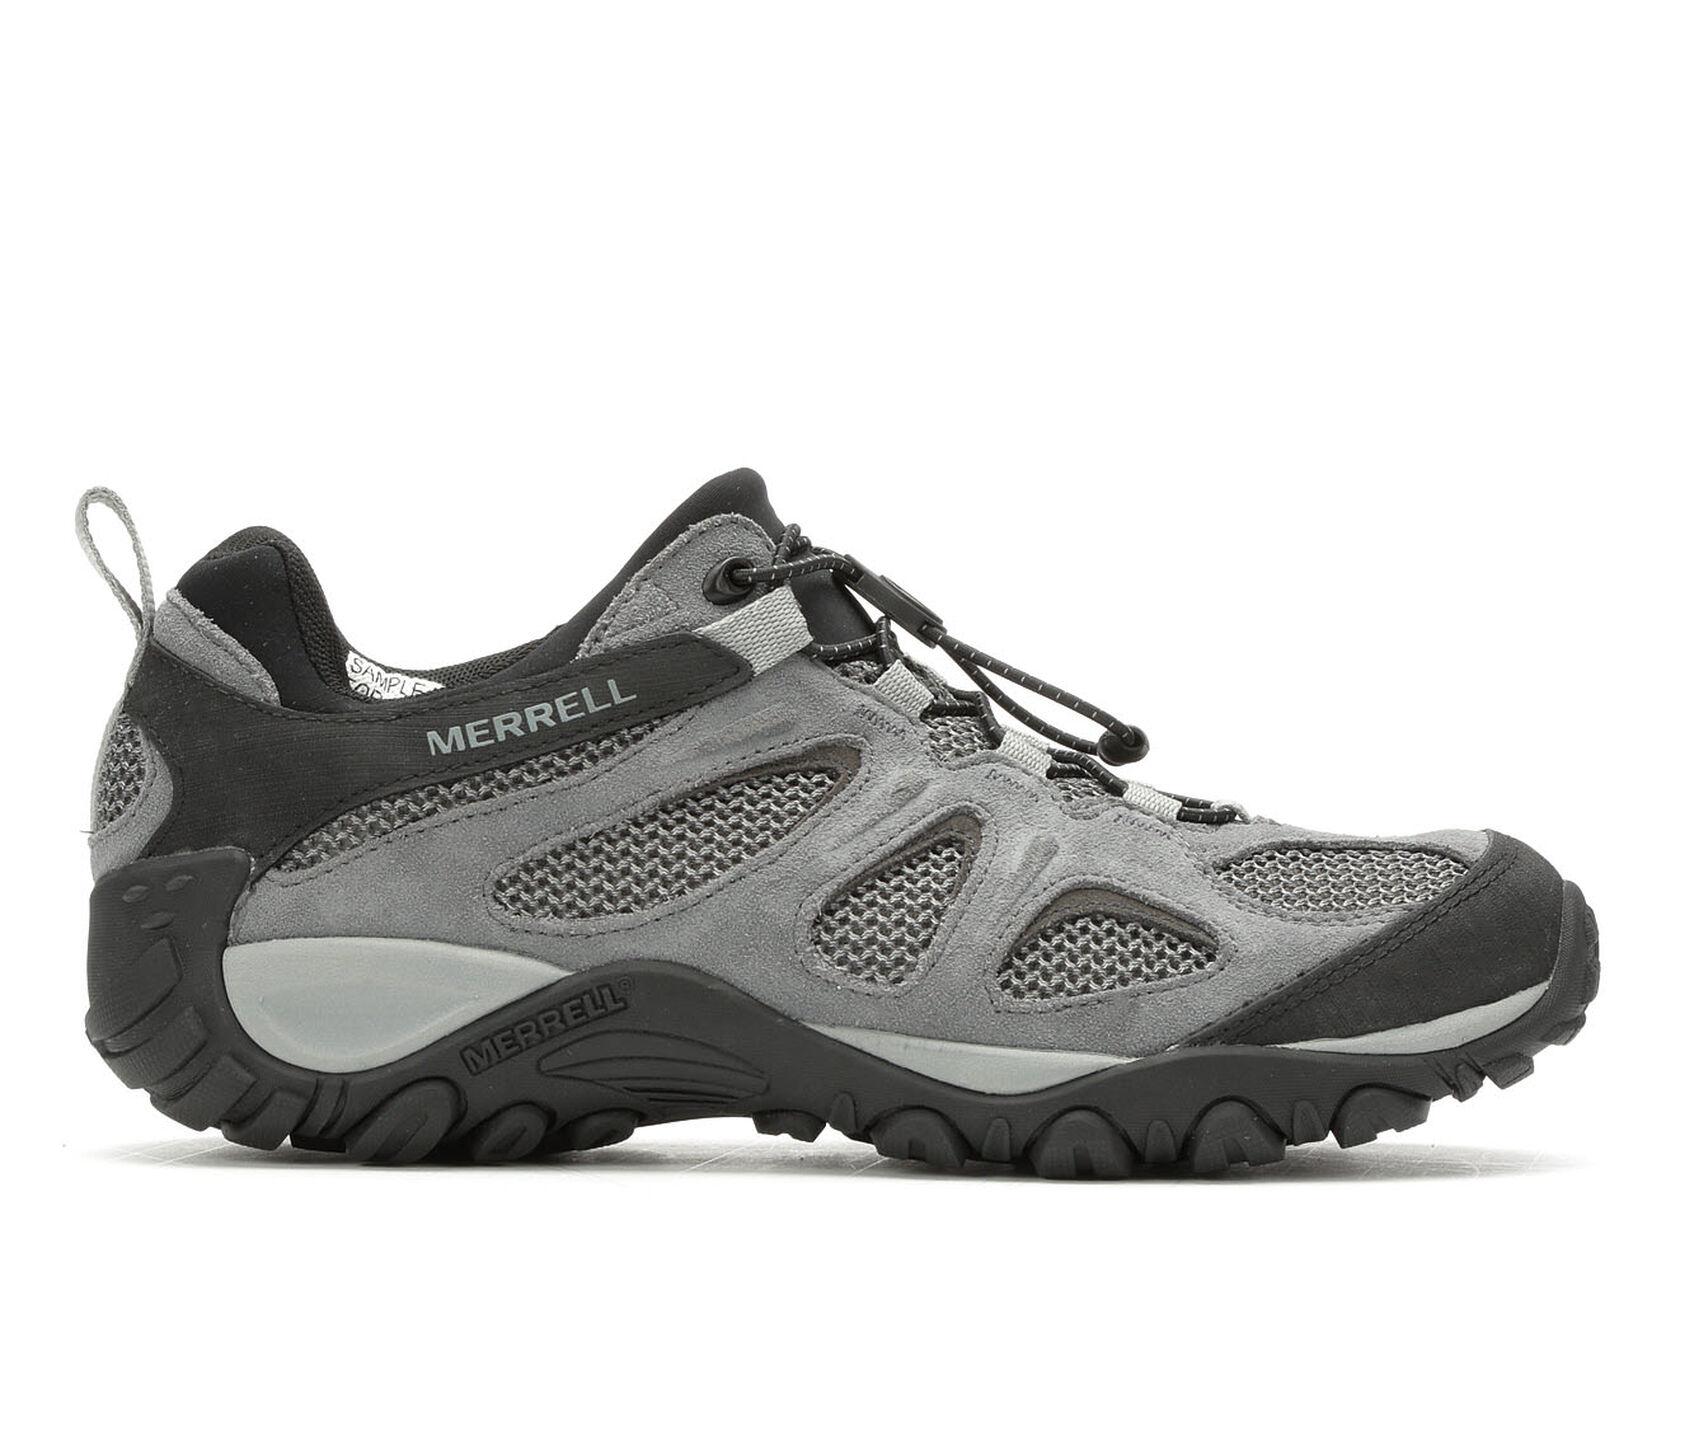 085608a207e9e8 Men's Merrell Yokota II Stretch Hiking Boots | Shoe Carnival